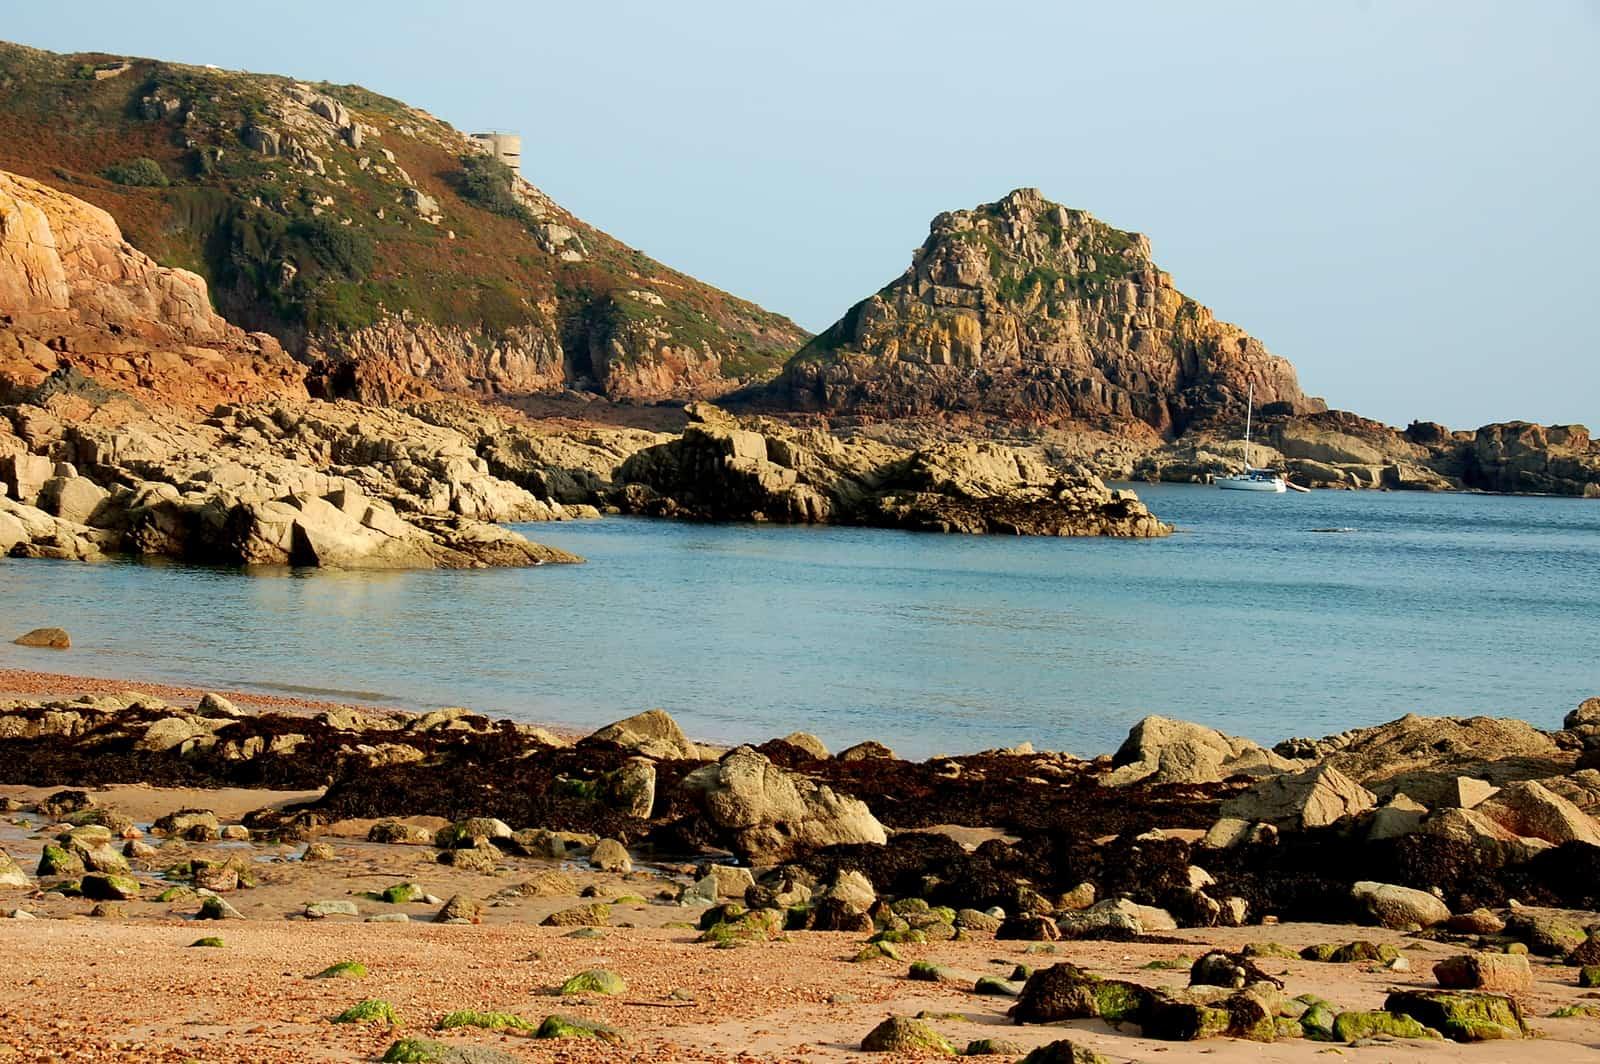 Portelot Bay on the Isle of Jersey